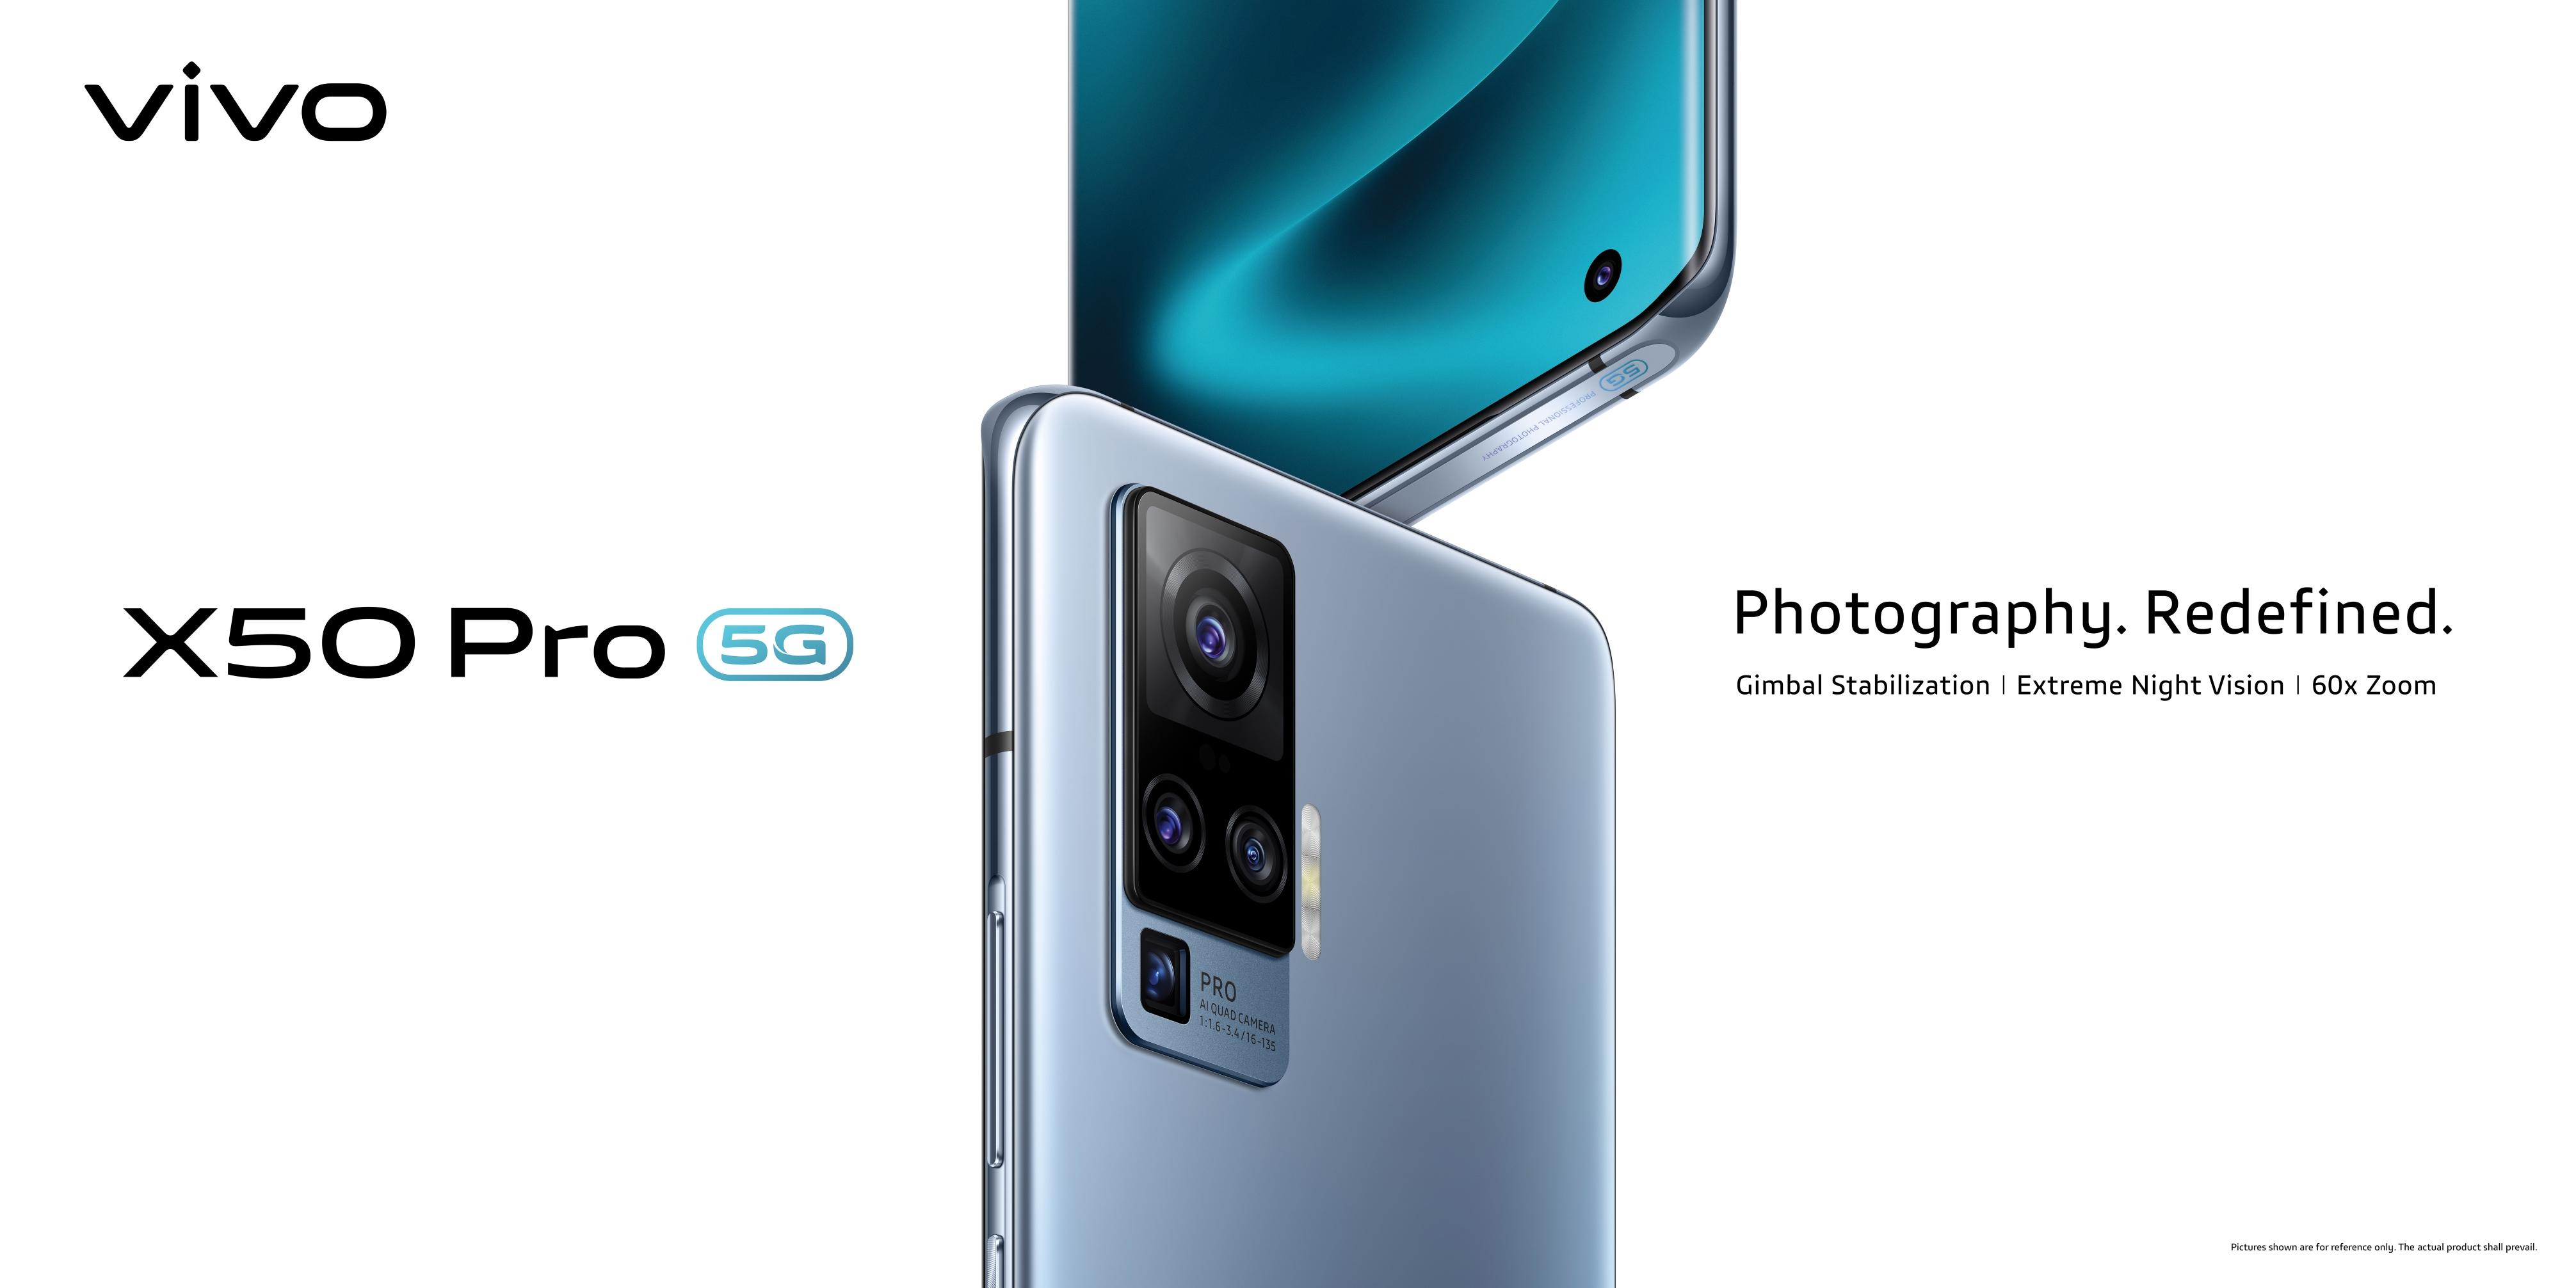 Vivo เปิดตัวสมาร์ตโฟนเรือธง Vivo X50 Pro 5G พร้อมเทคโนโลยี Gimbal ระบบกันสั่นสุดล้ำรุ่นแรกของโลก